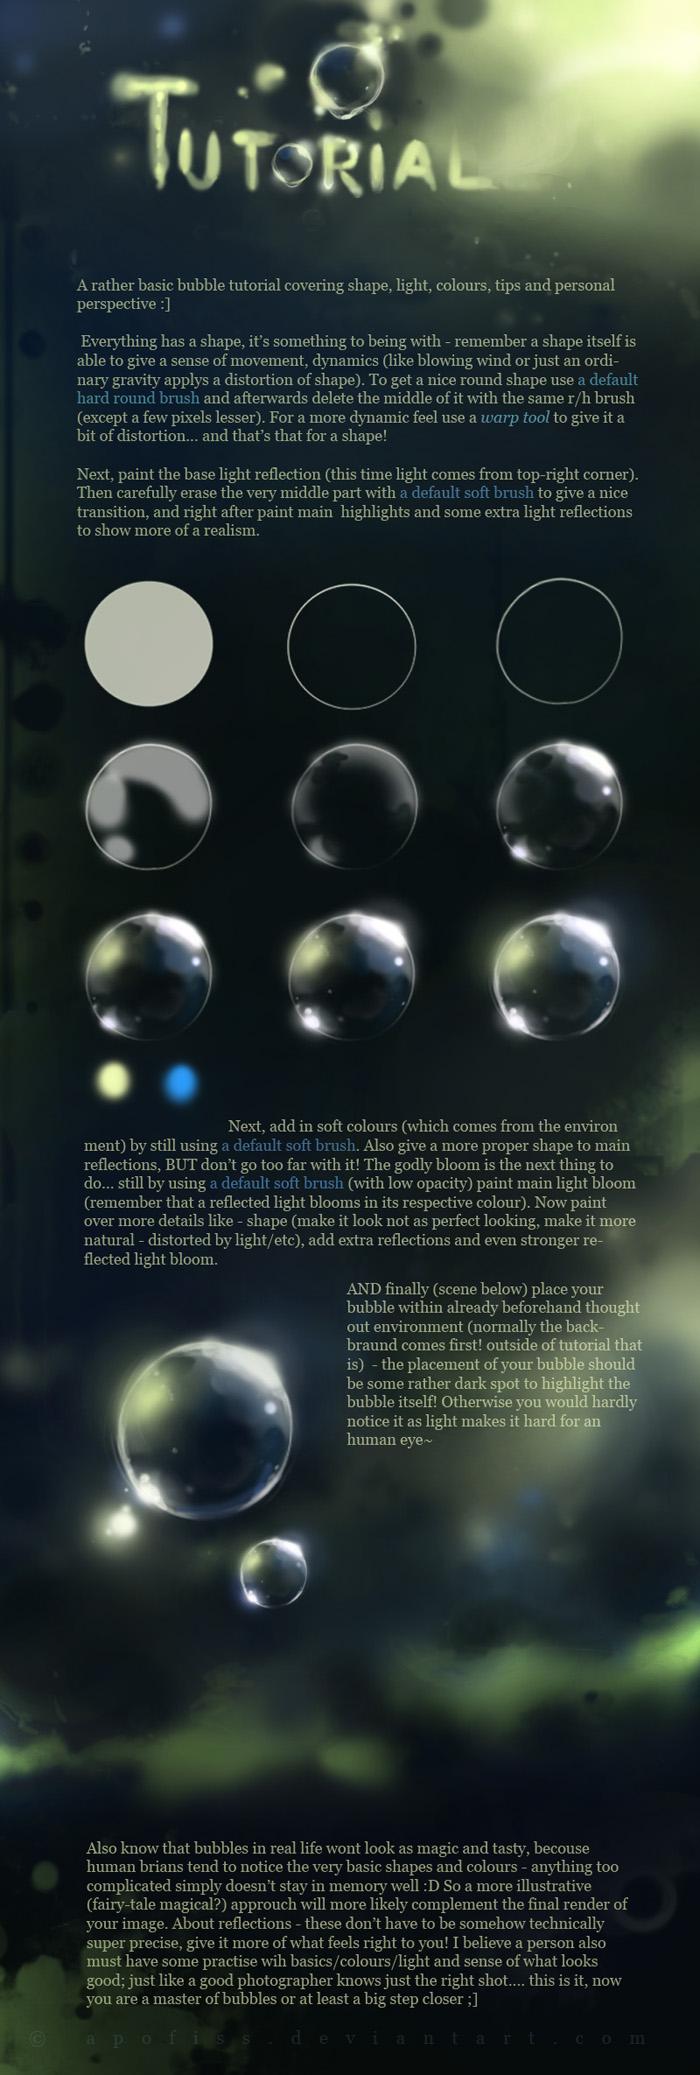 MAGIC bubble tutorial by Apofiss